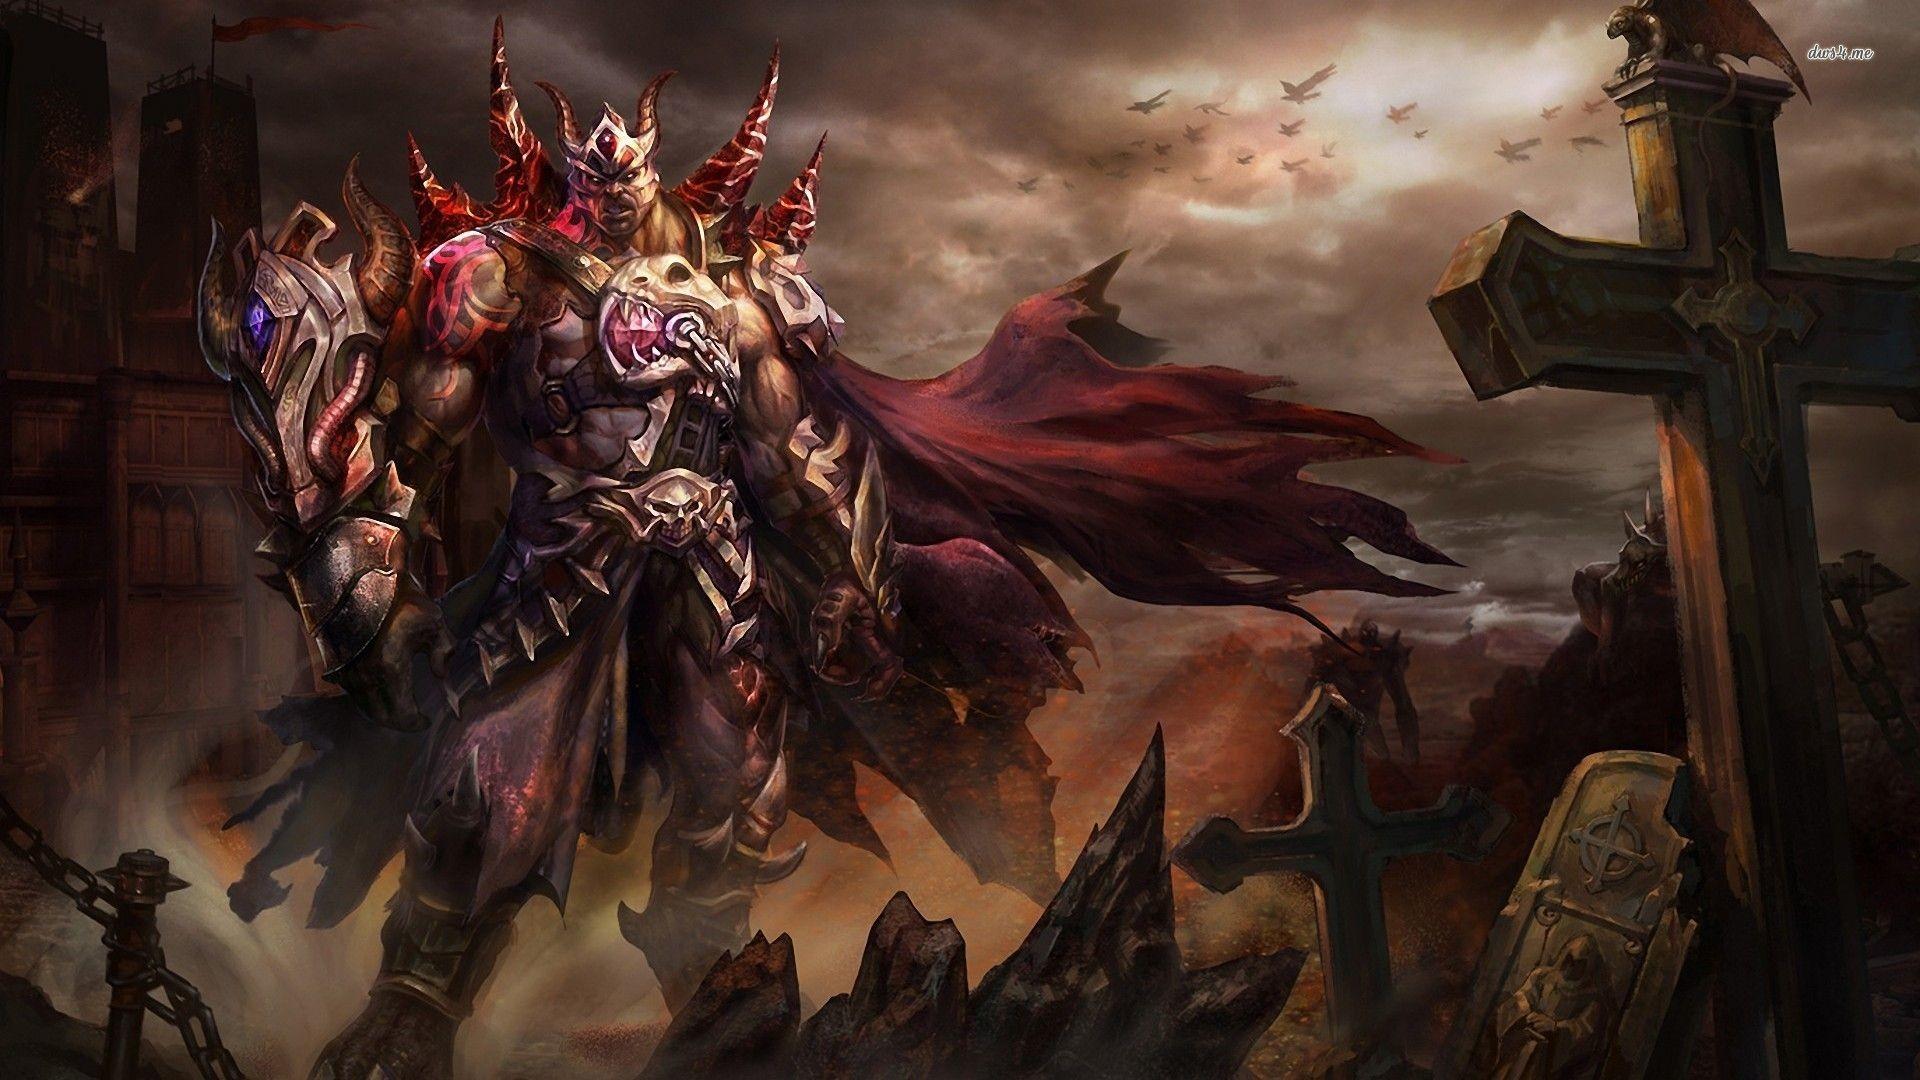 Res: 1920x1080, Demon Warrior | Demon warrior wallpaper